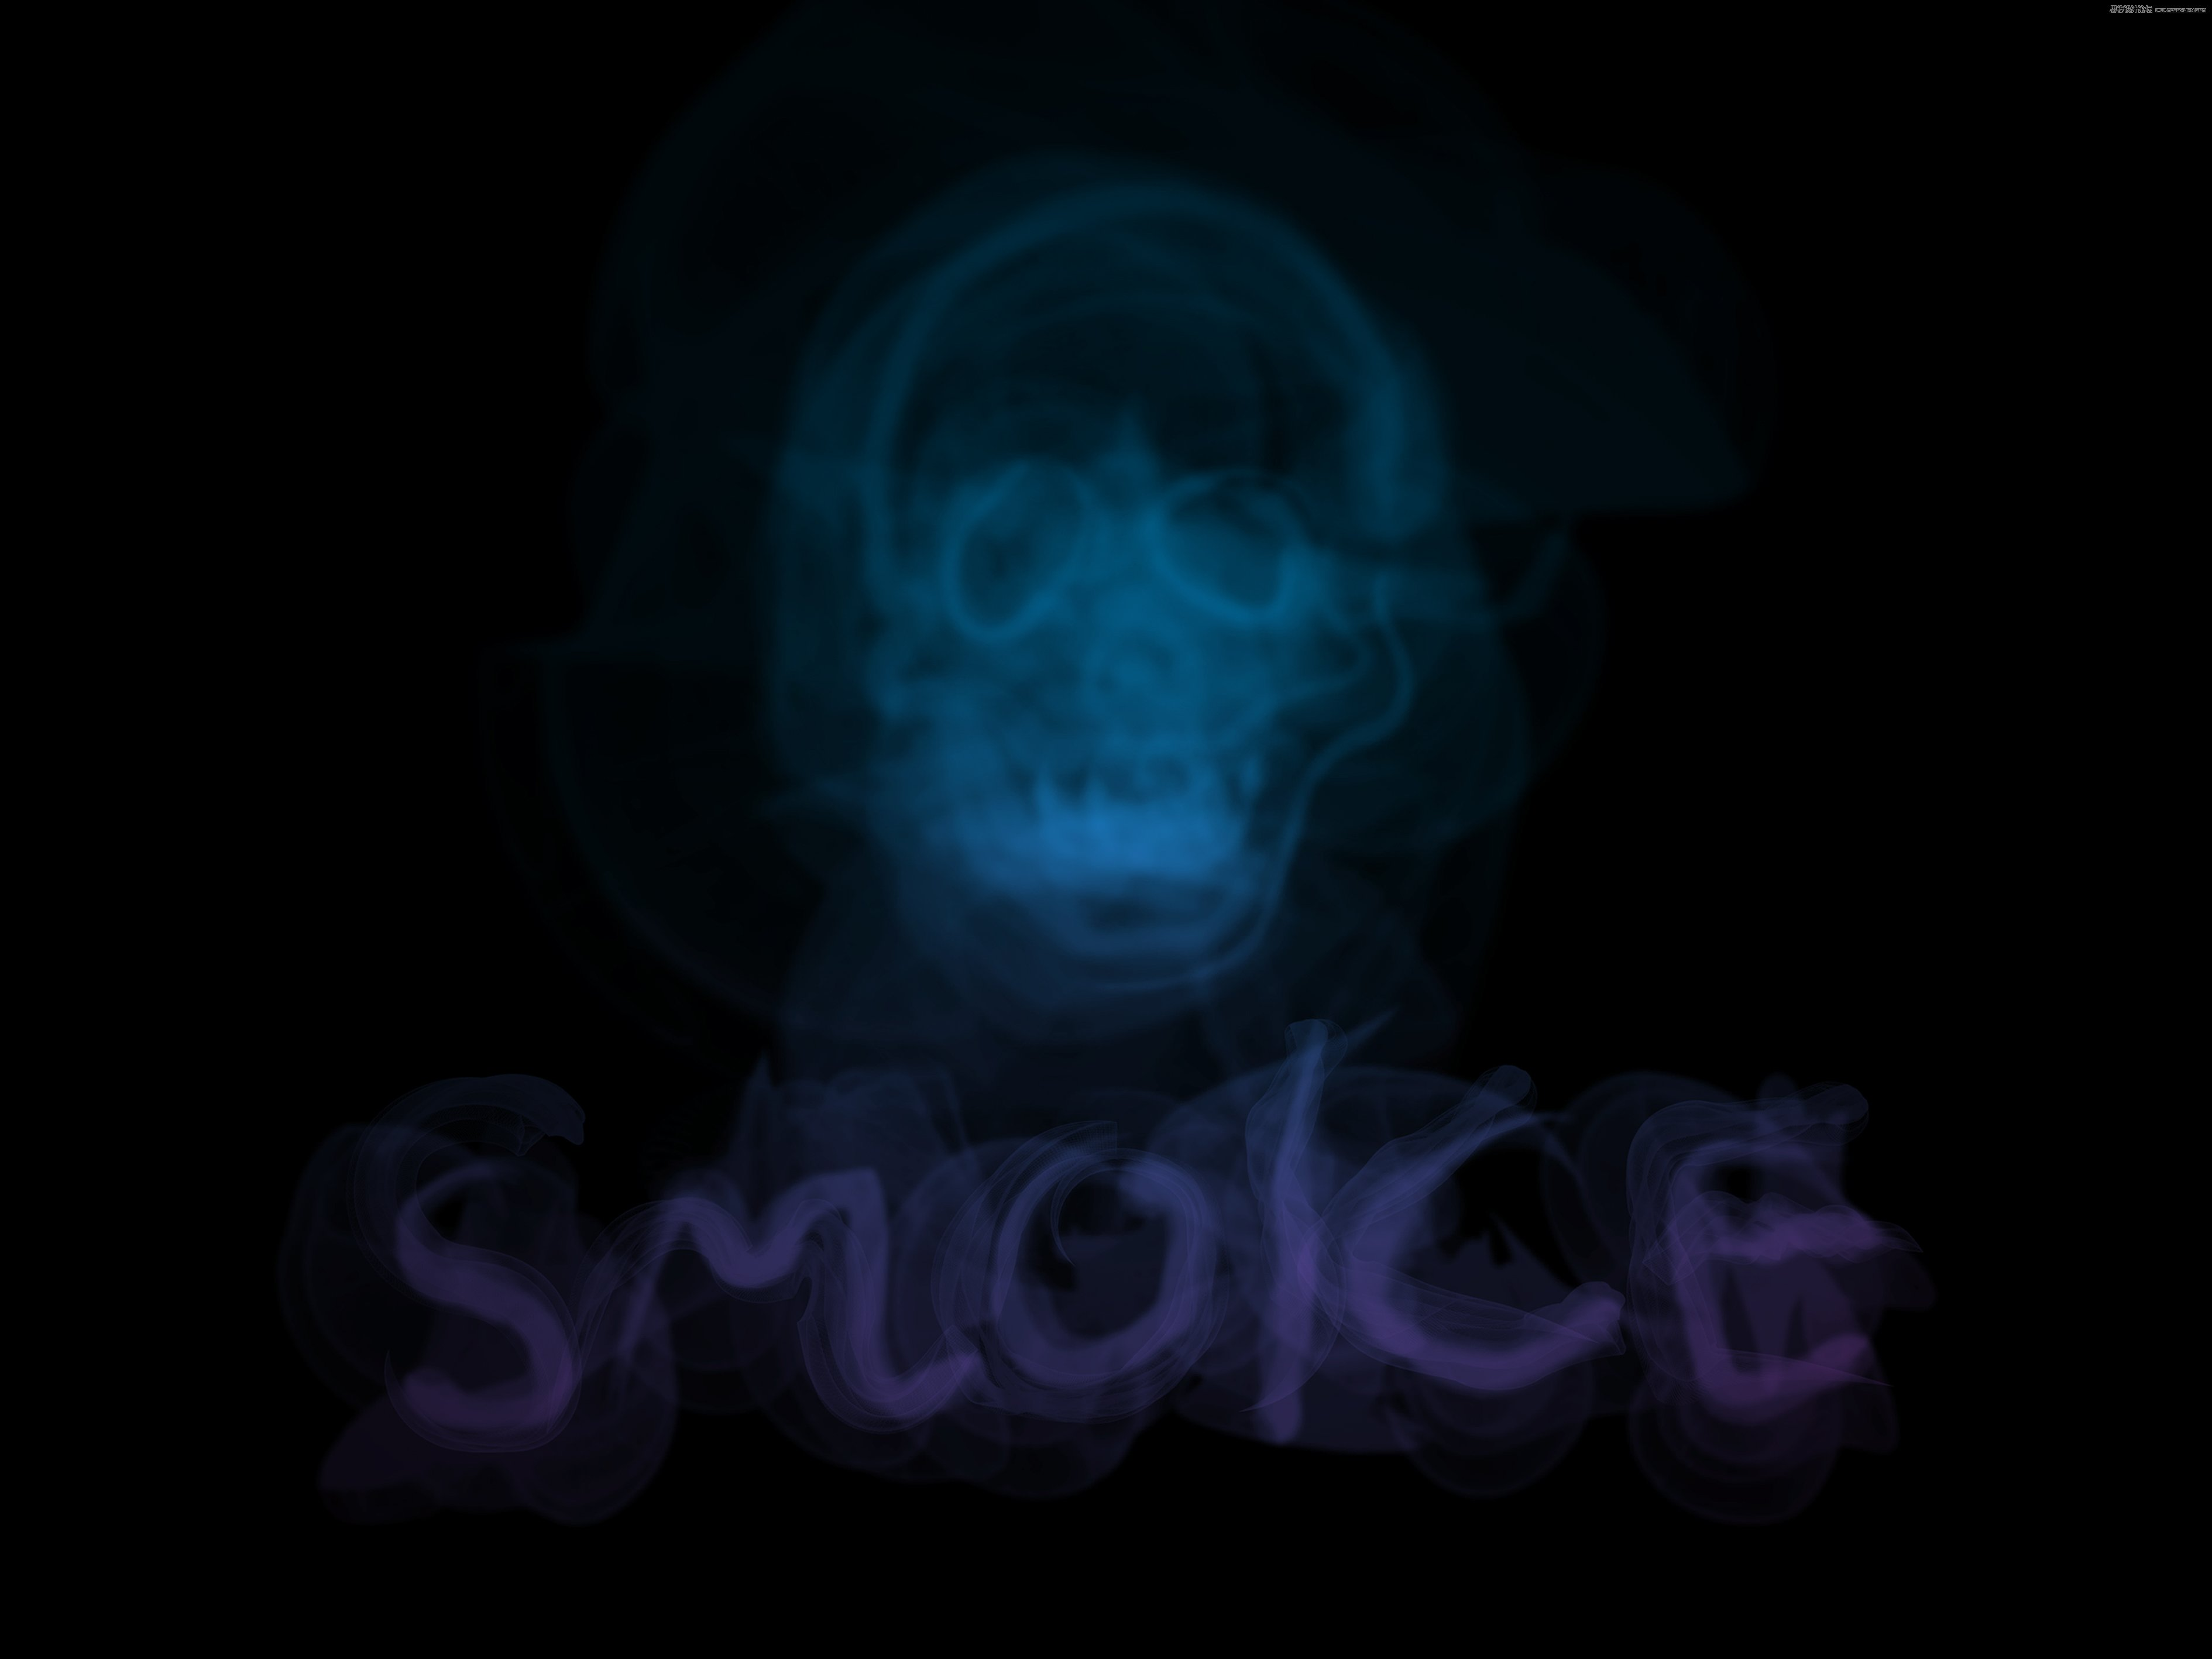 Illustrator制作烟雾缭绕的艺术字教程